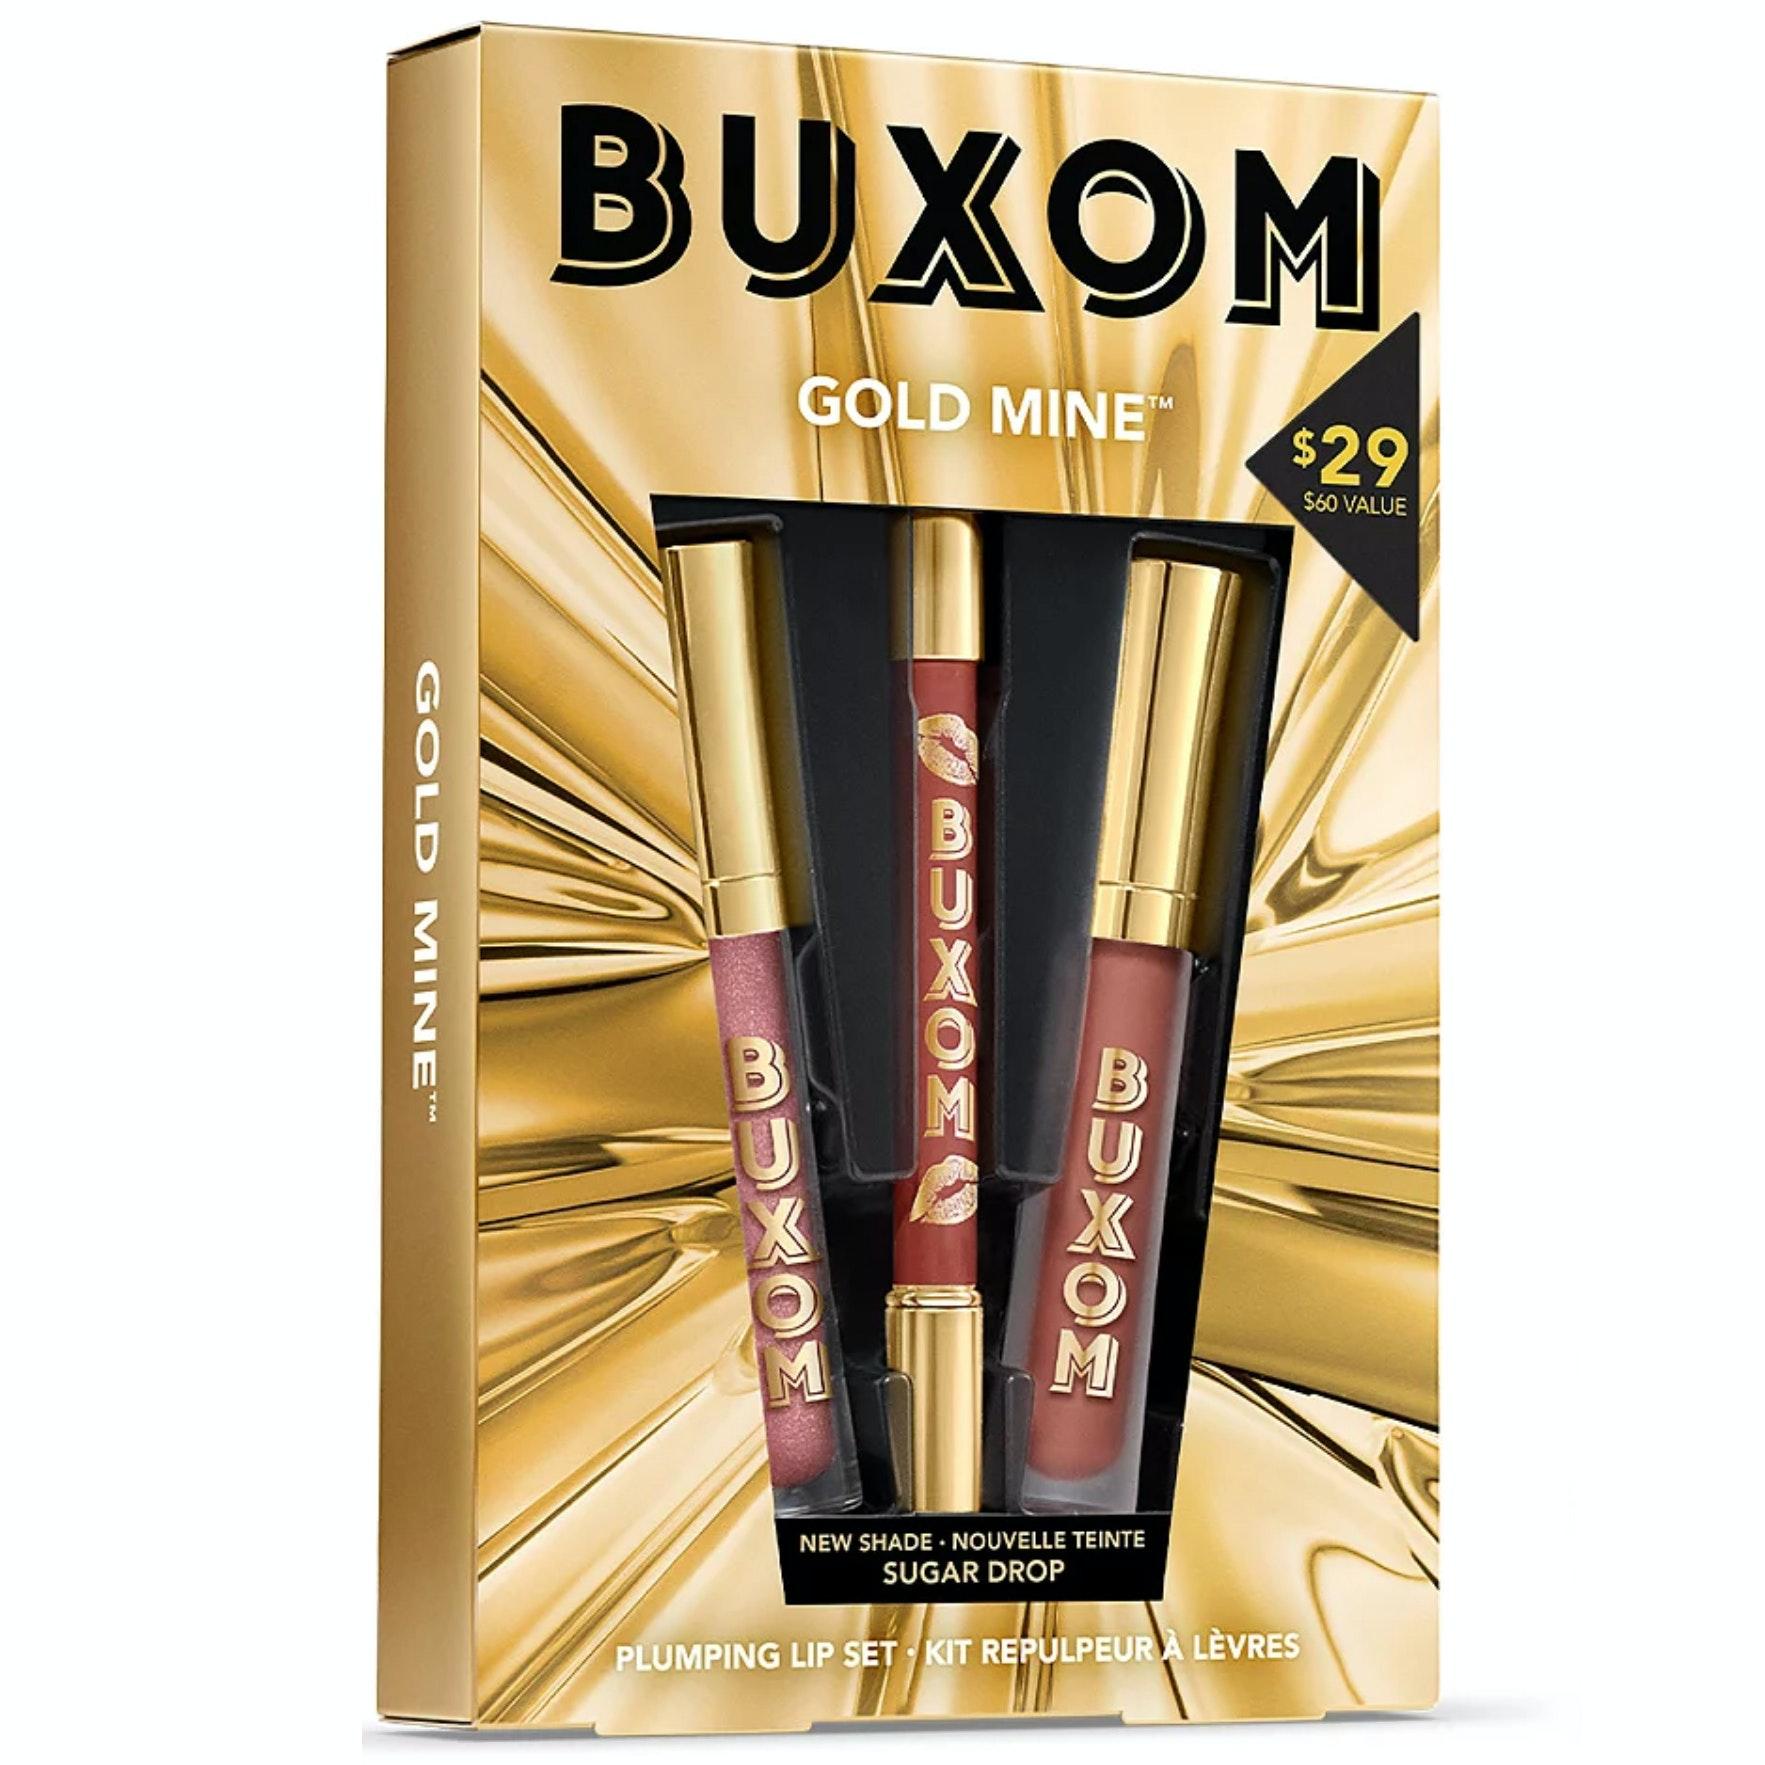 Buxom Gold Mine™ Plumping Lip Set